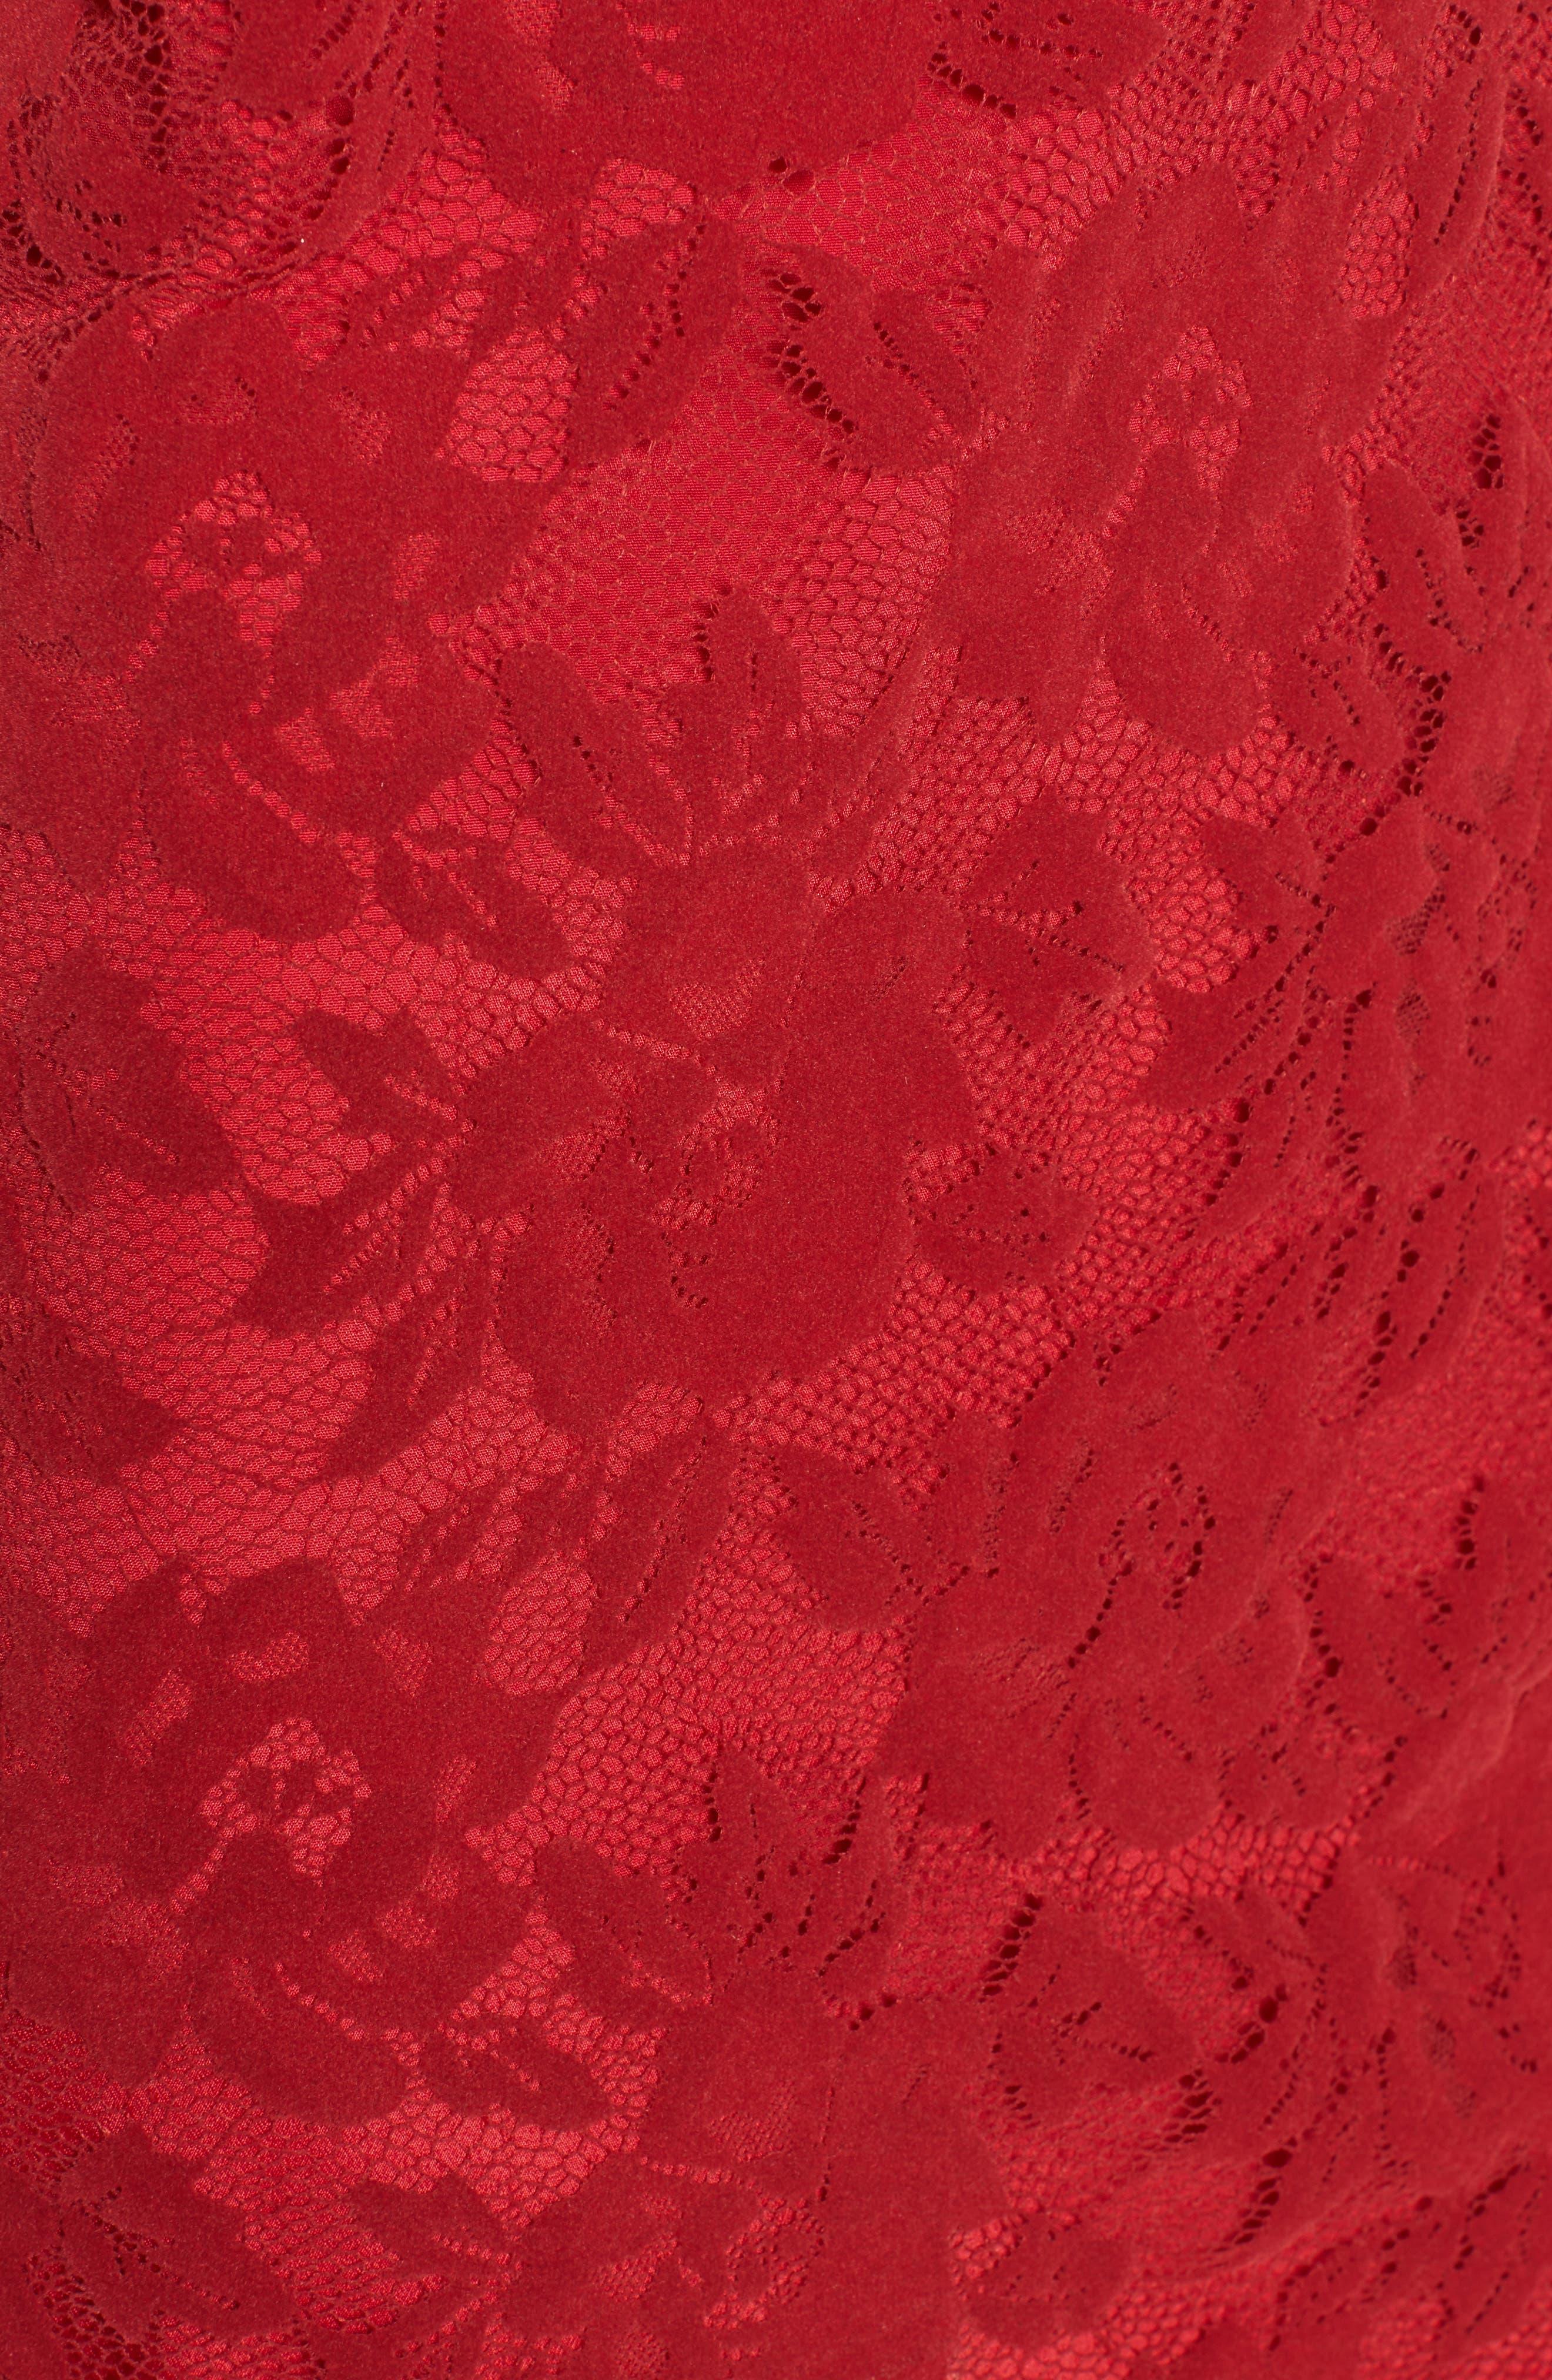 Caspian Lace Sheath Dress,                             Alternate thumbnail 5, color,